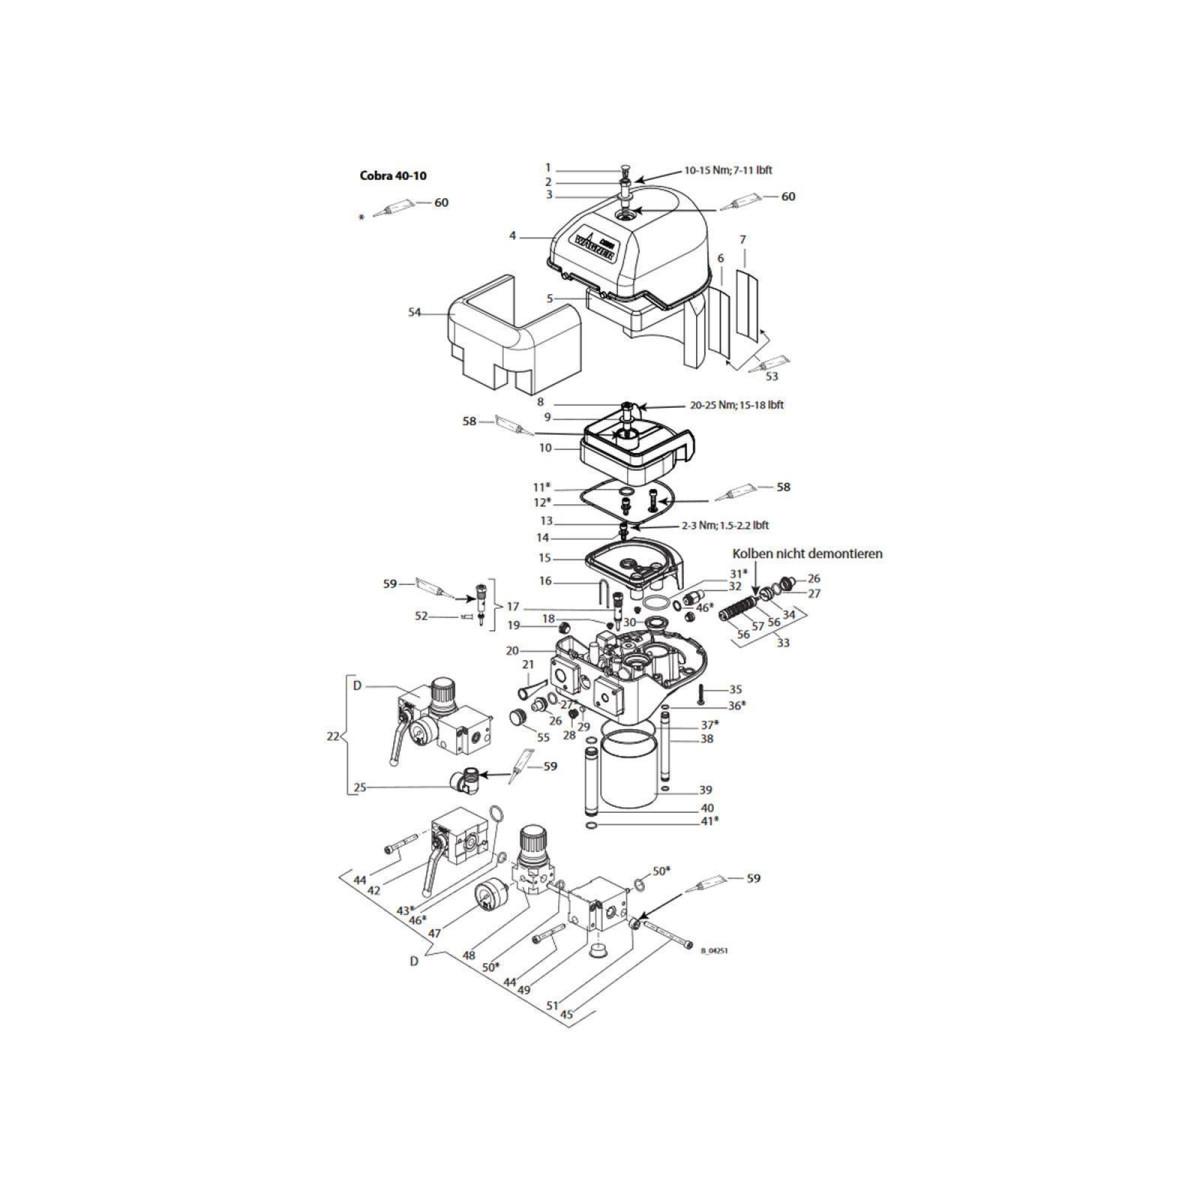 Ersatzteile luftmotor cobra 40 10 23 14 for Piezas de repuesto